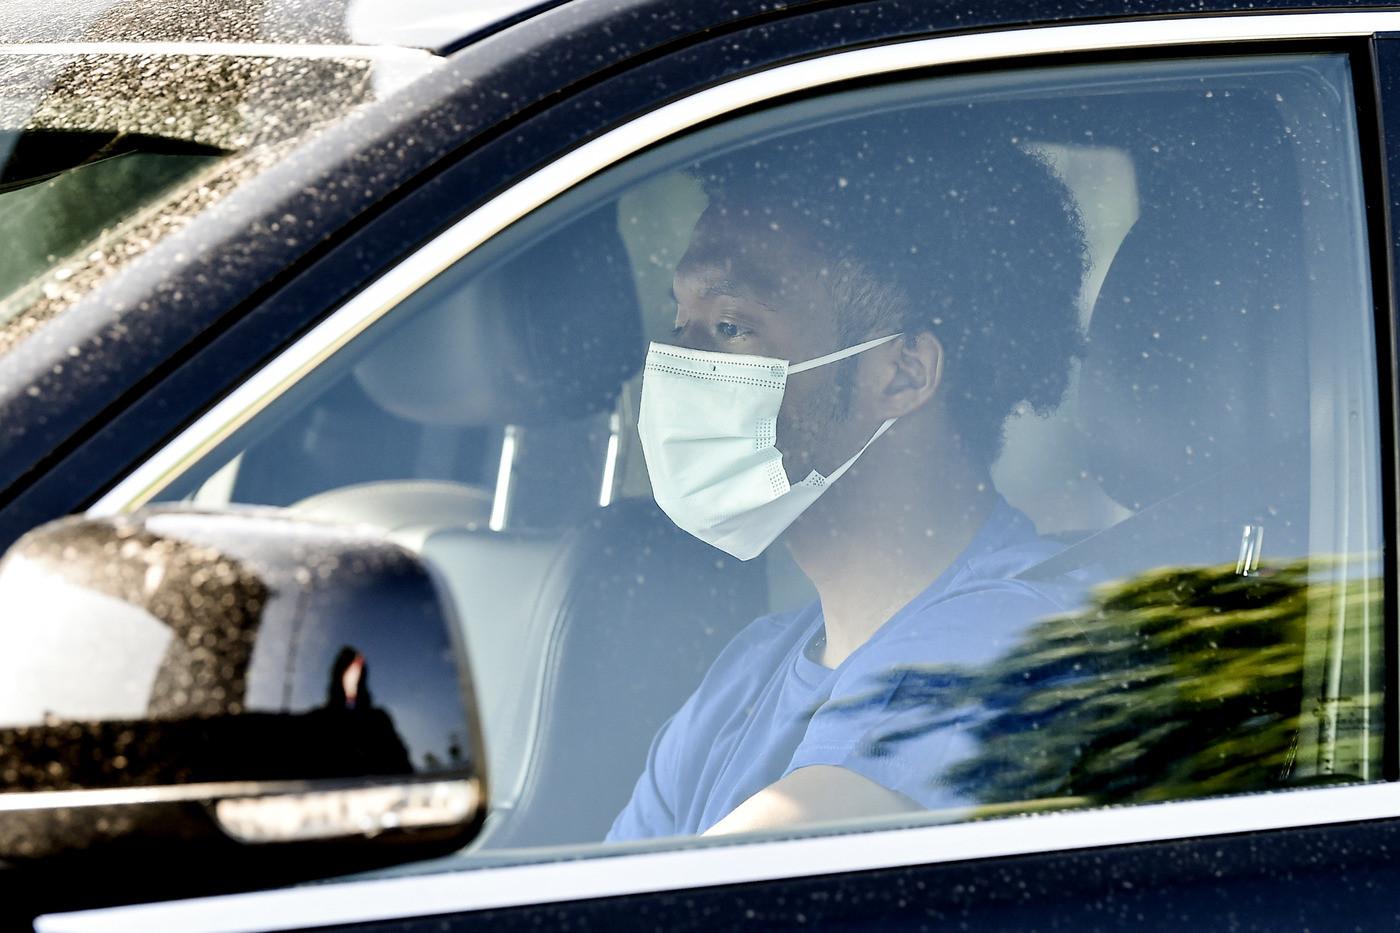 Serie A: Coronavirus, La Juventus arriva alla Continassa